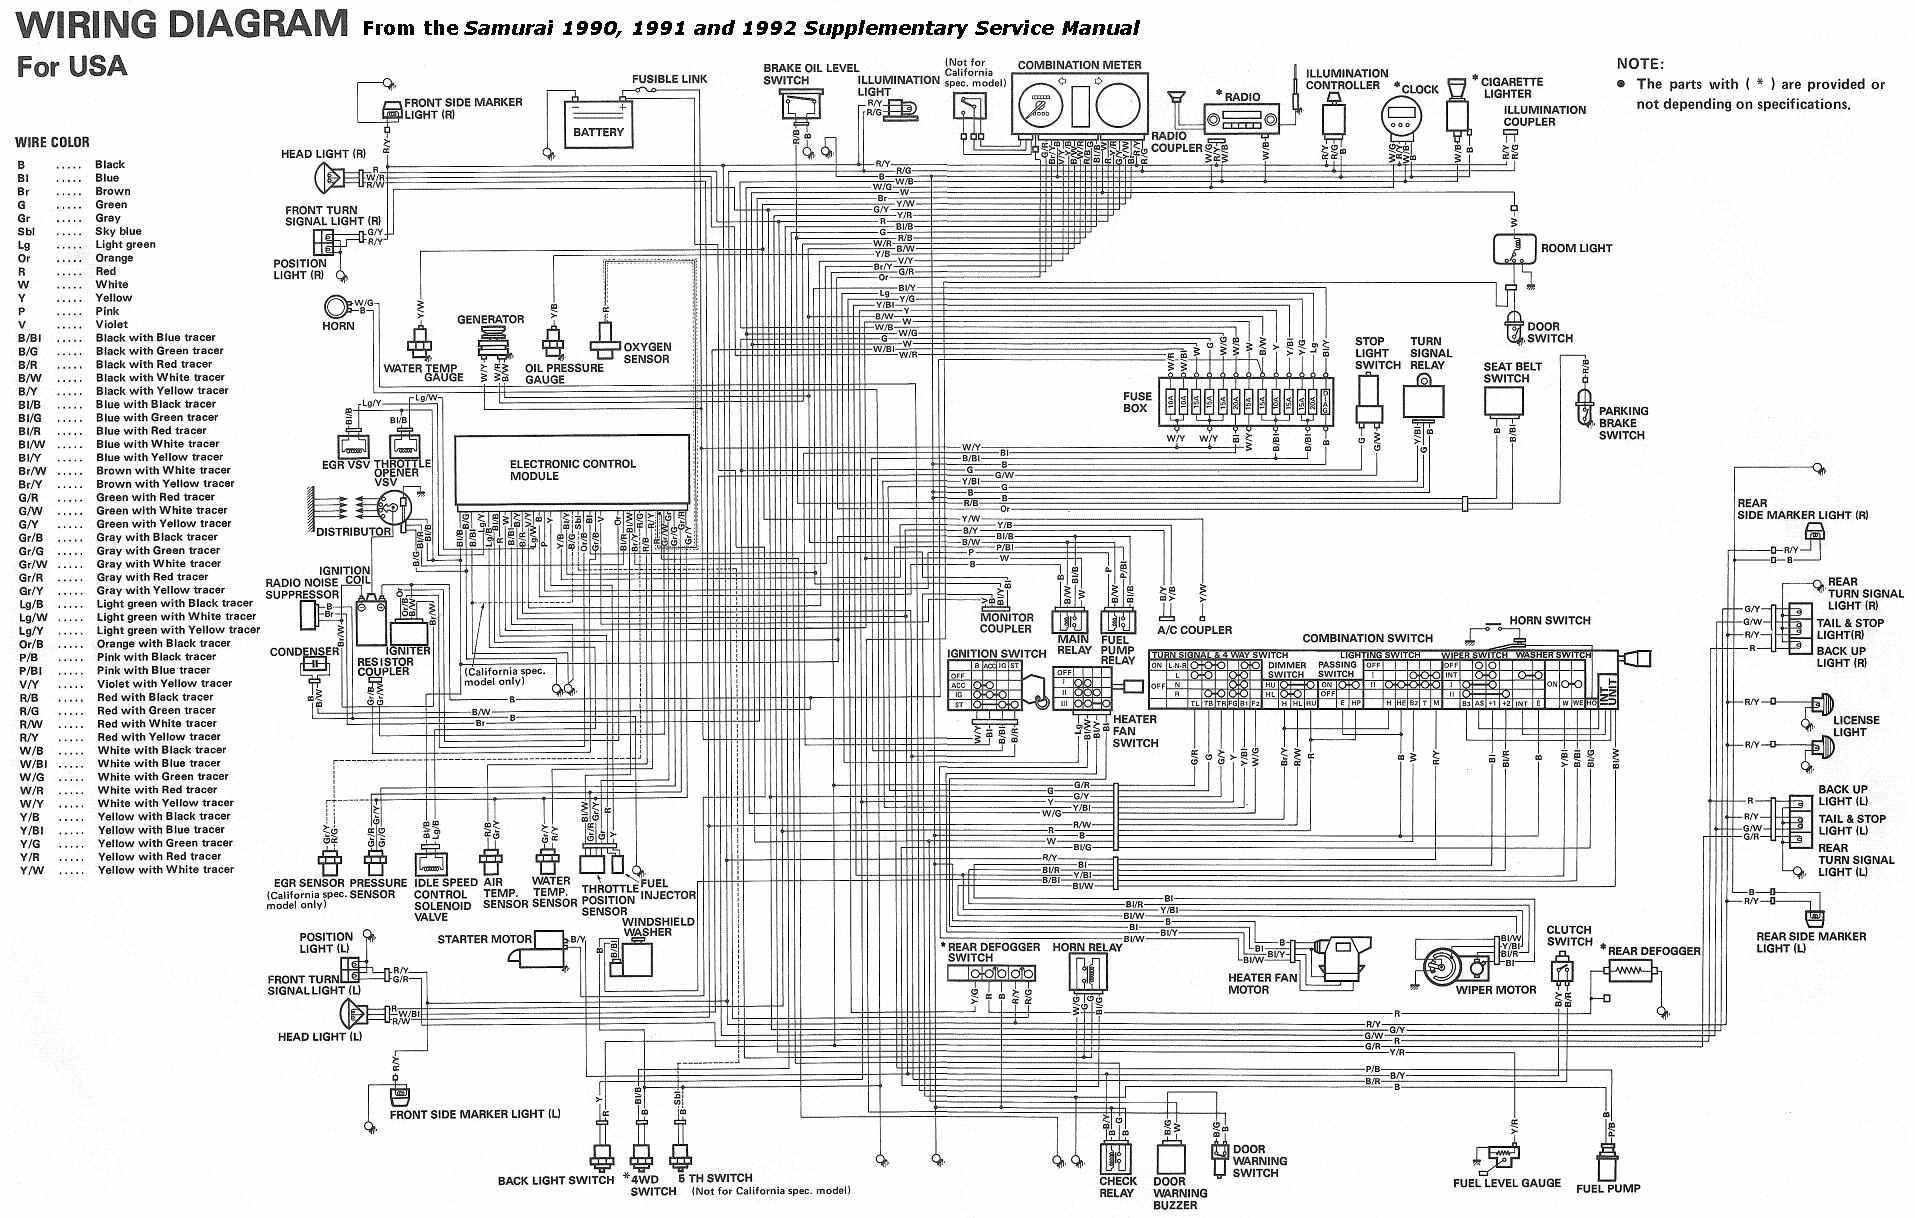 hight resolution of 1995 yamaha wolverine wiring diagram archive of automotive wiring kawasaki prairie 700 wiring diagram 1995 yamaha